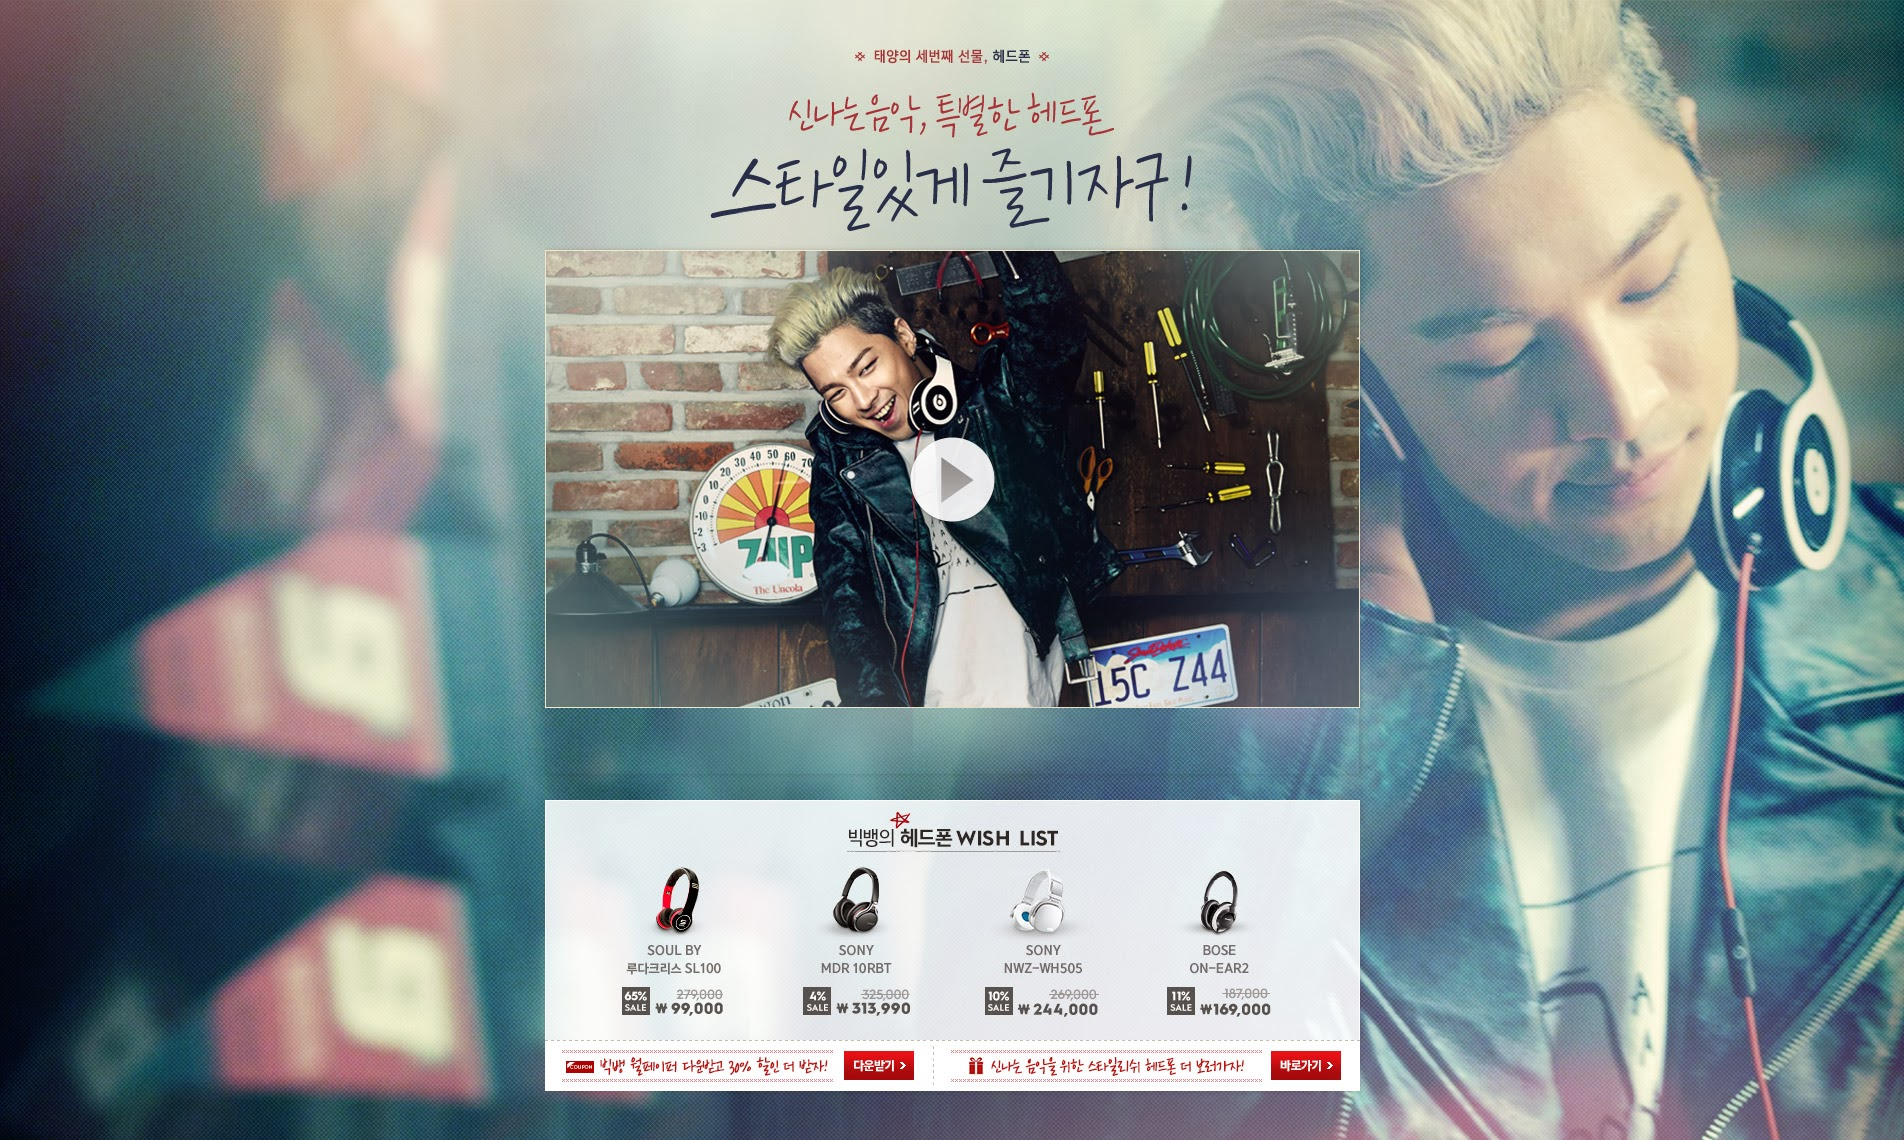 Big Bang - Gmarket - 2013 - Tae Yang - 20.jpg